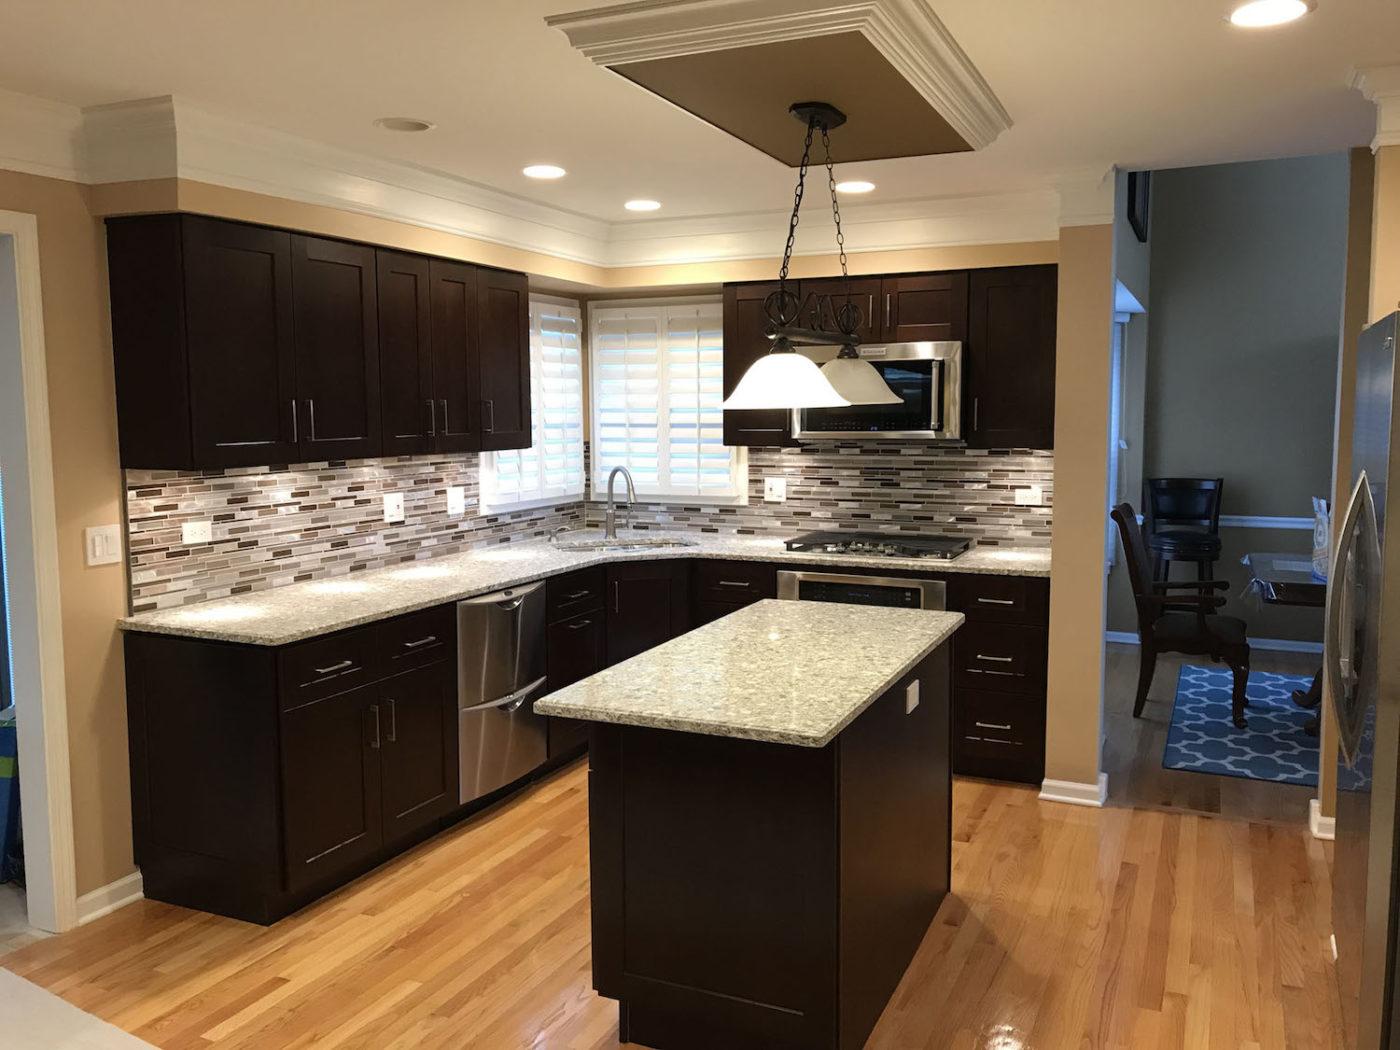 Kitchen-Remodeling-in-Hoffman-Estates